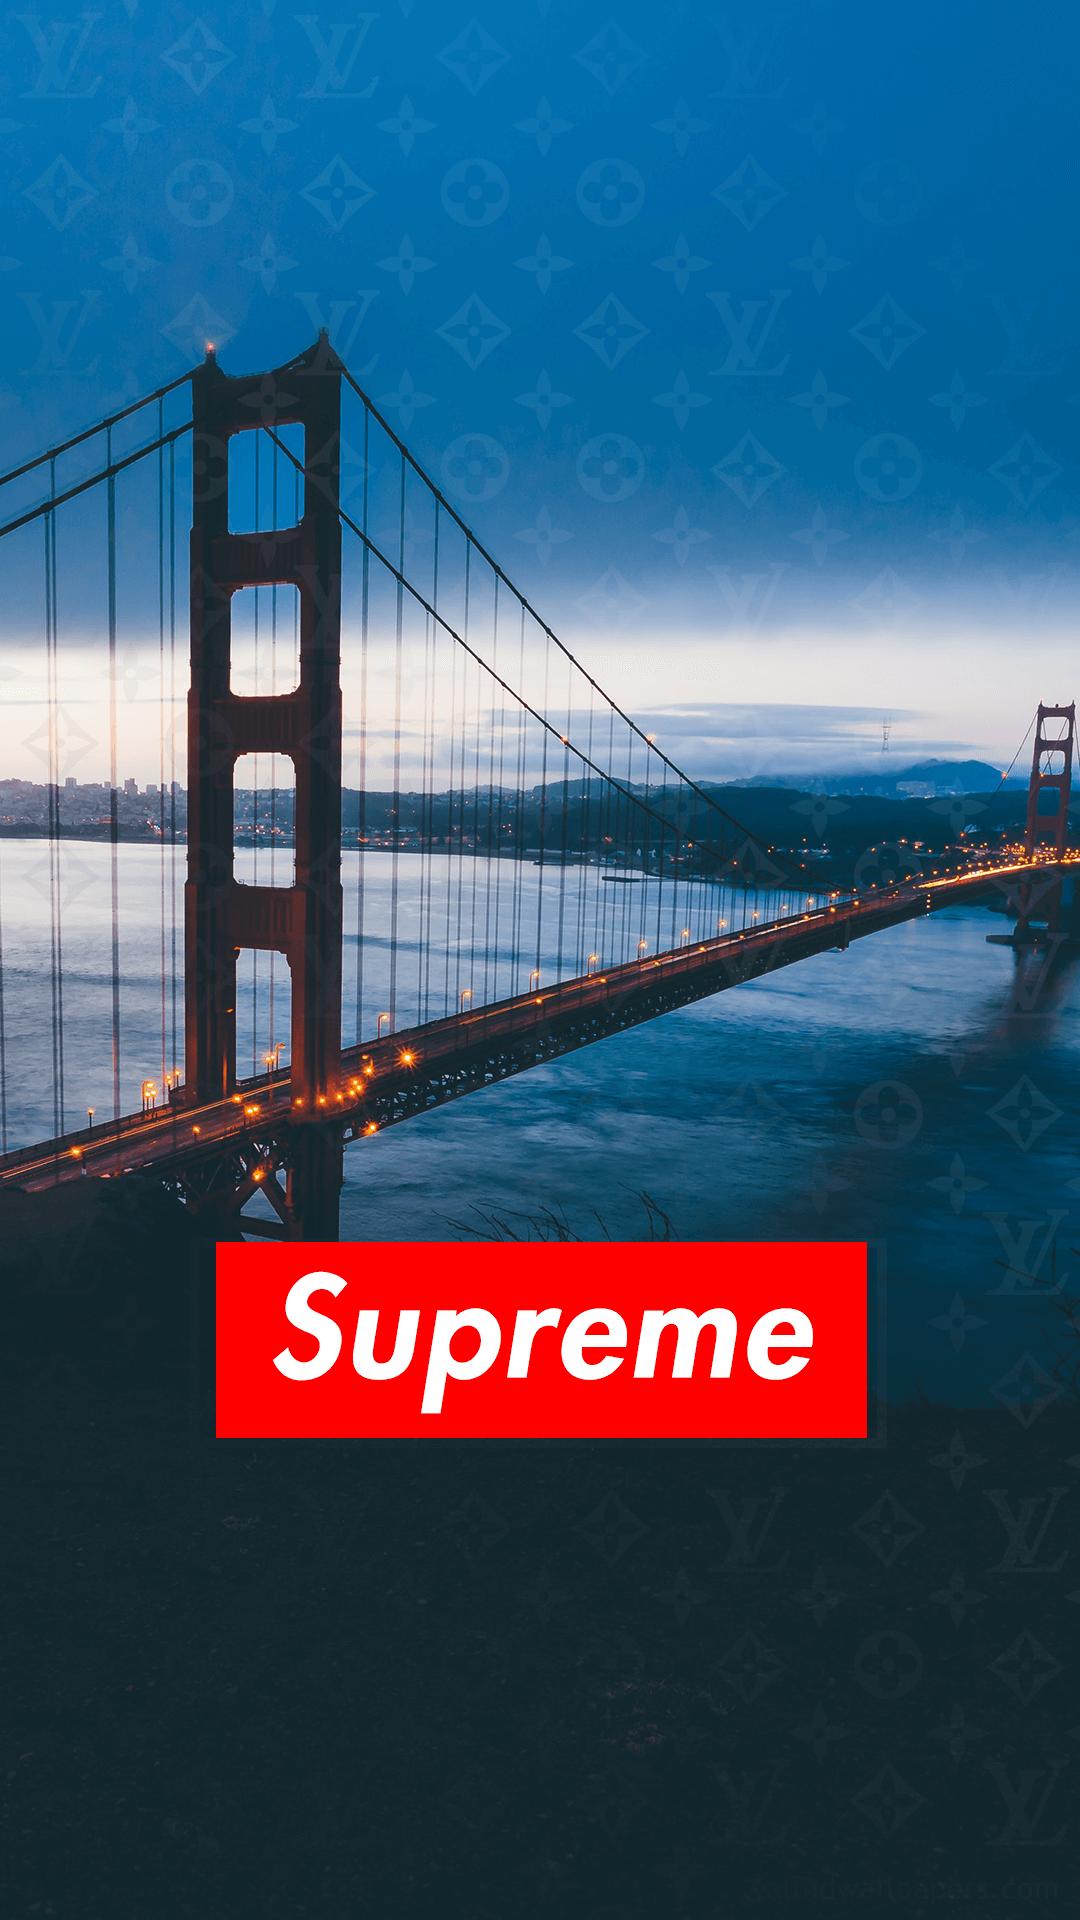 70+ Supreme Wallpapers in 4K AllHDWallpapers